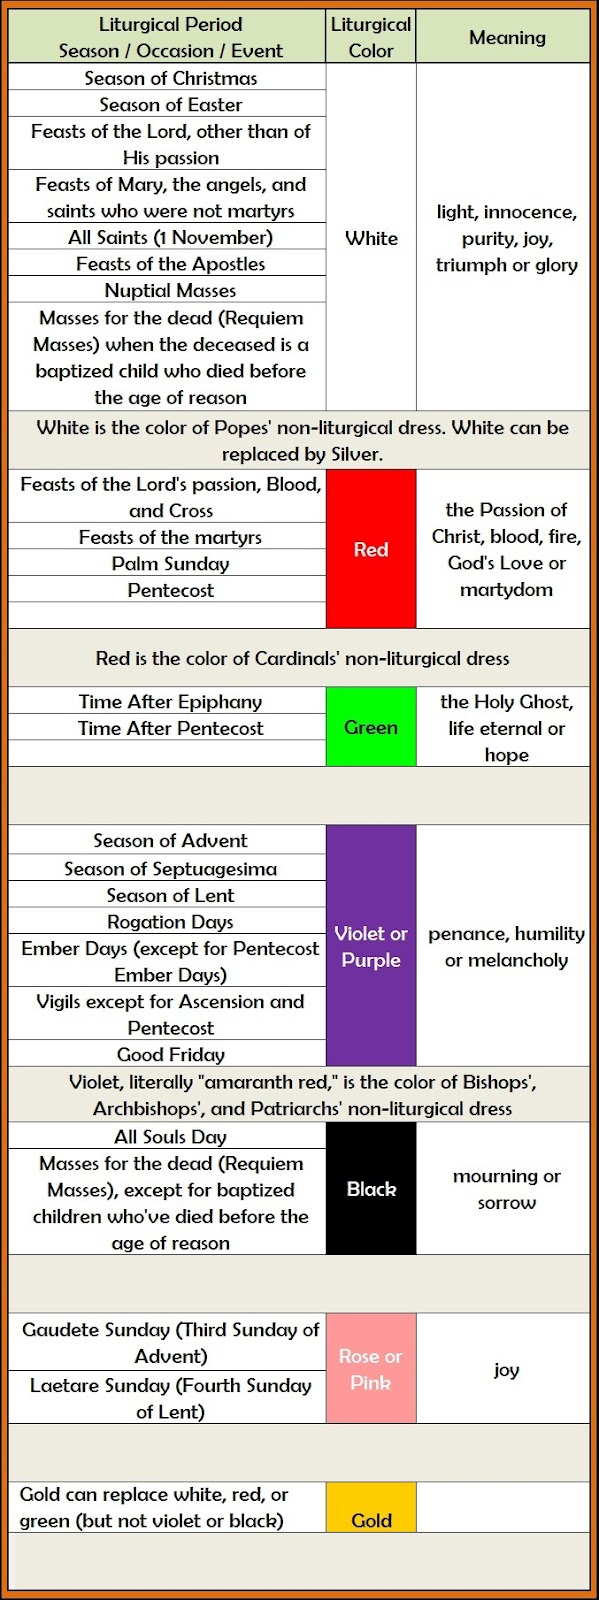 Religious Calendar Definition 2017 Holidays 2017 Calendar Of Events Teaching Ideas Liturgical Colors New Calendar Template Site